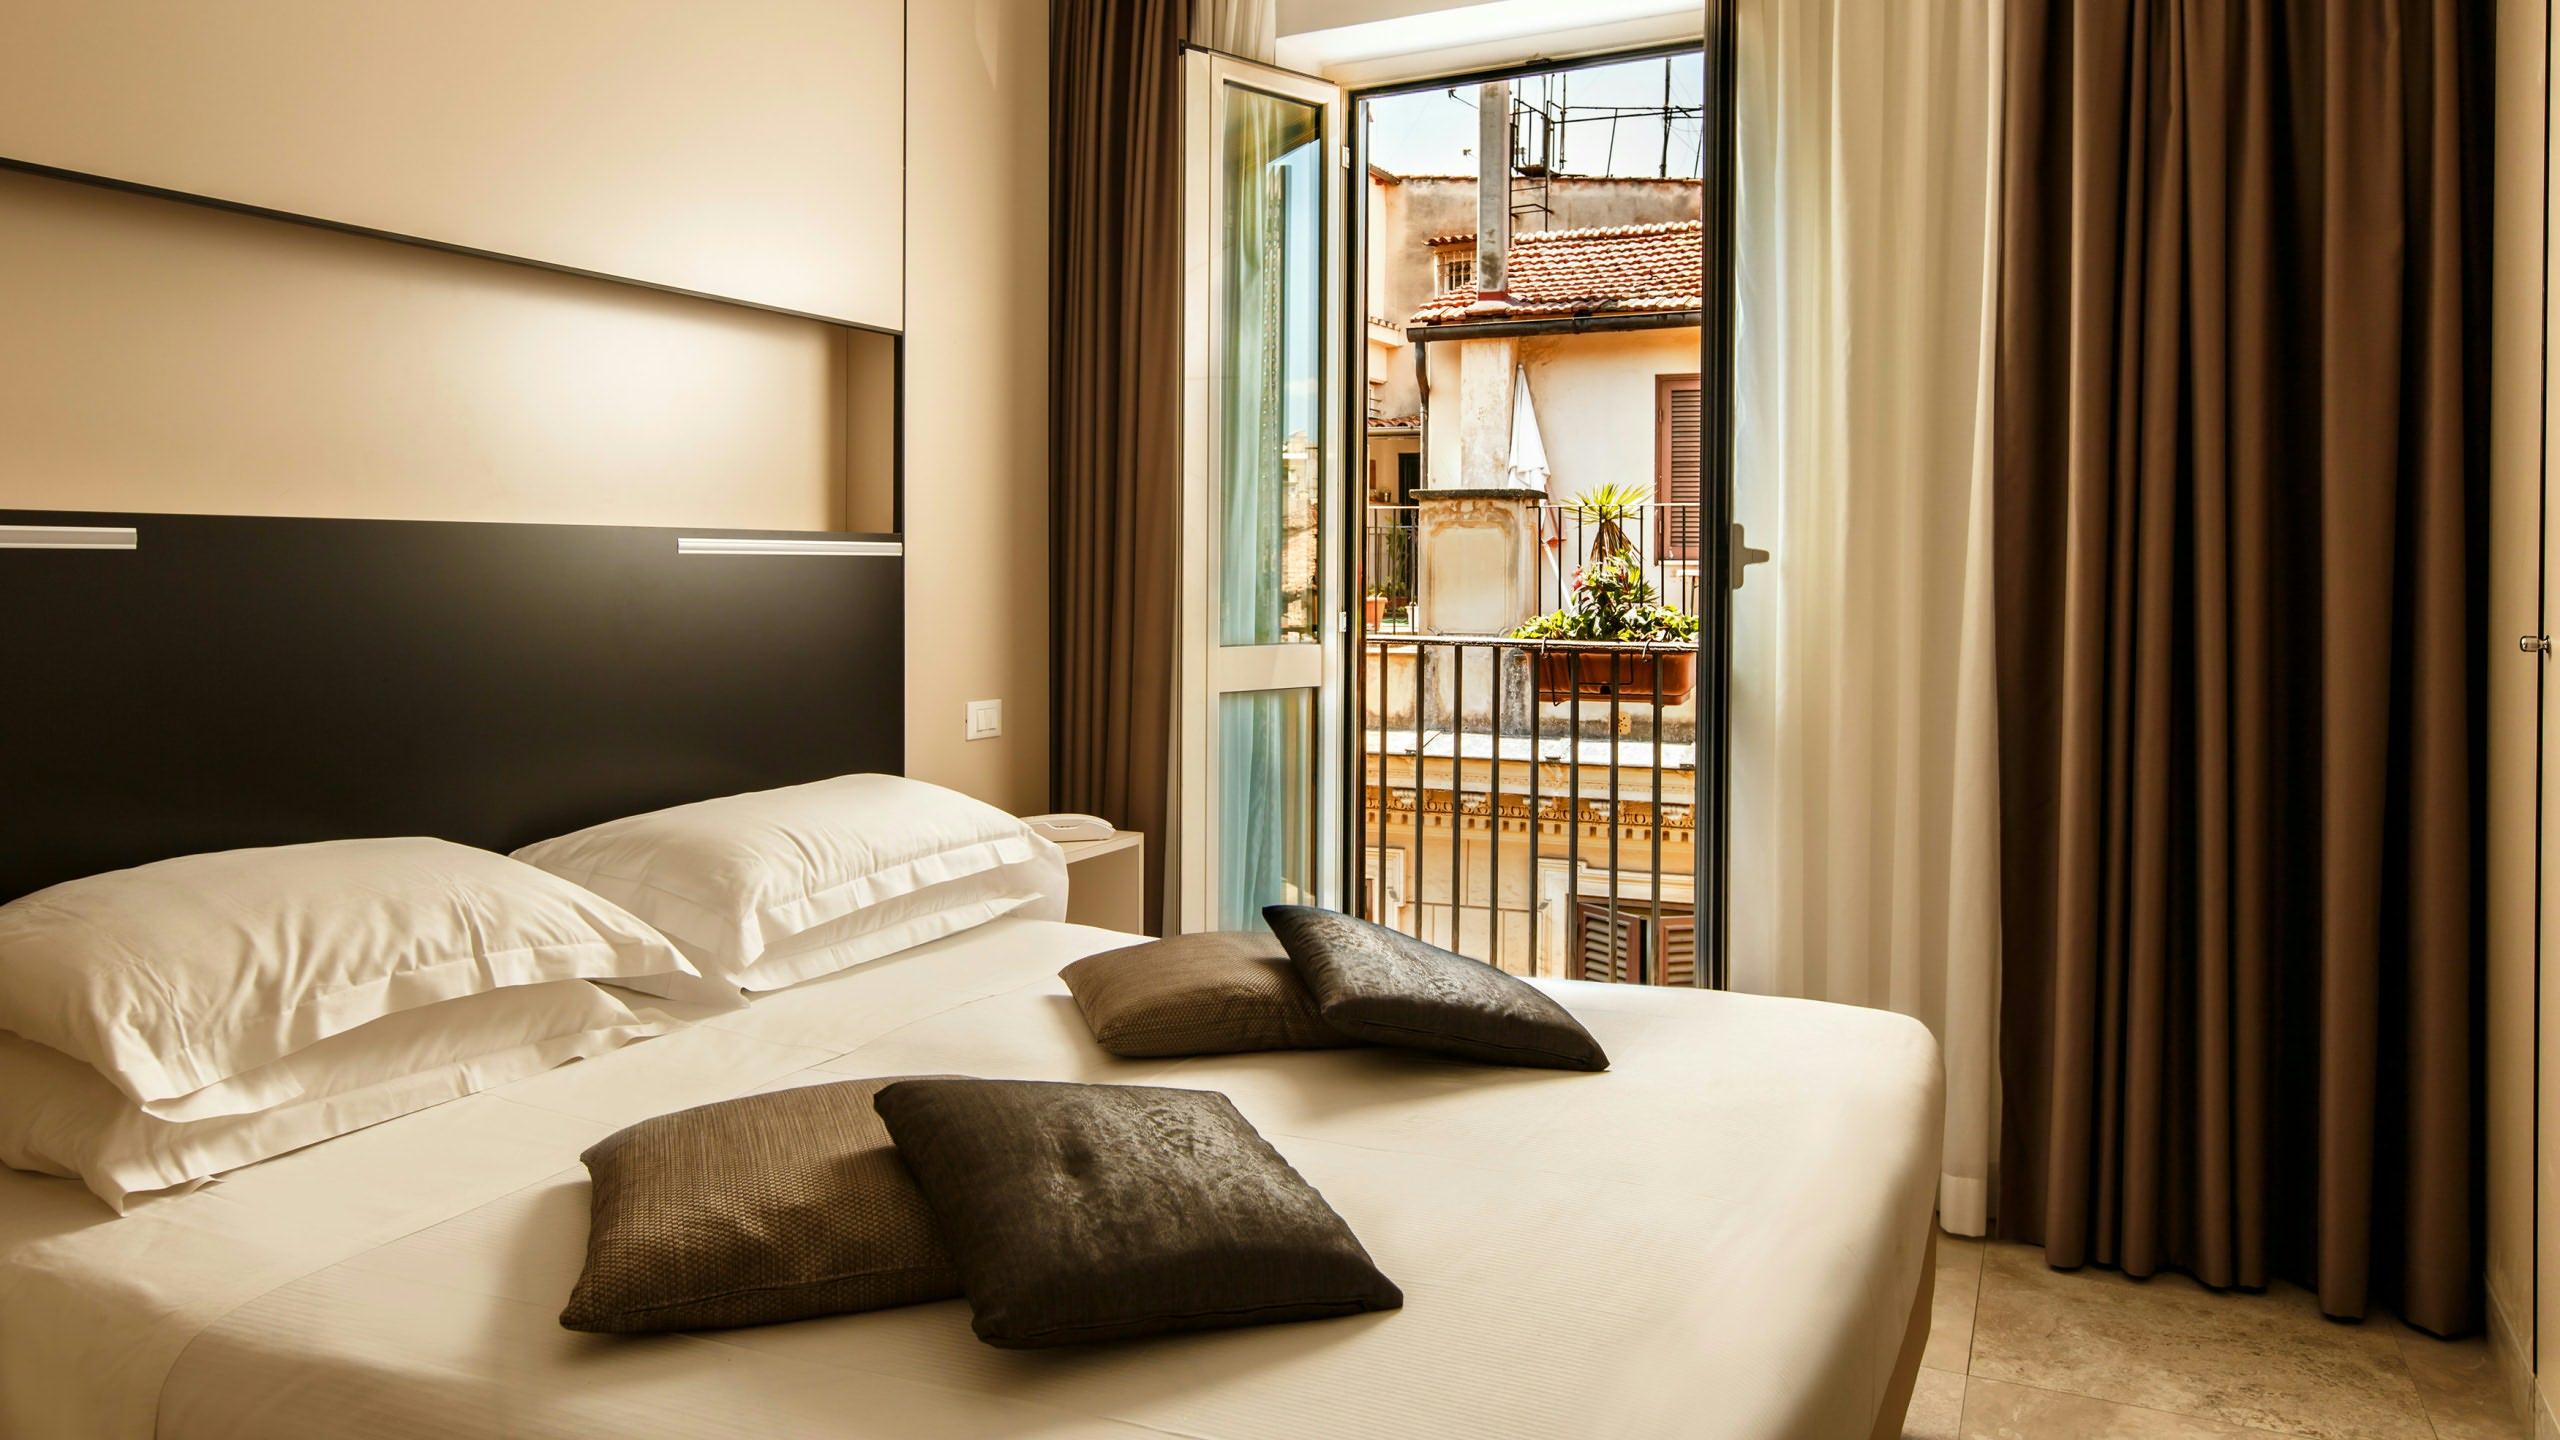 hotel-smeraldo-rome-slide3